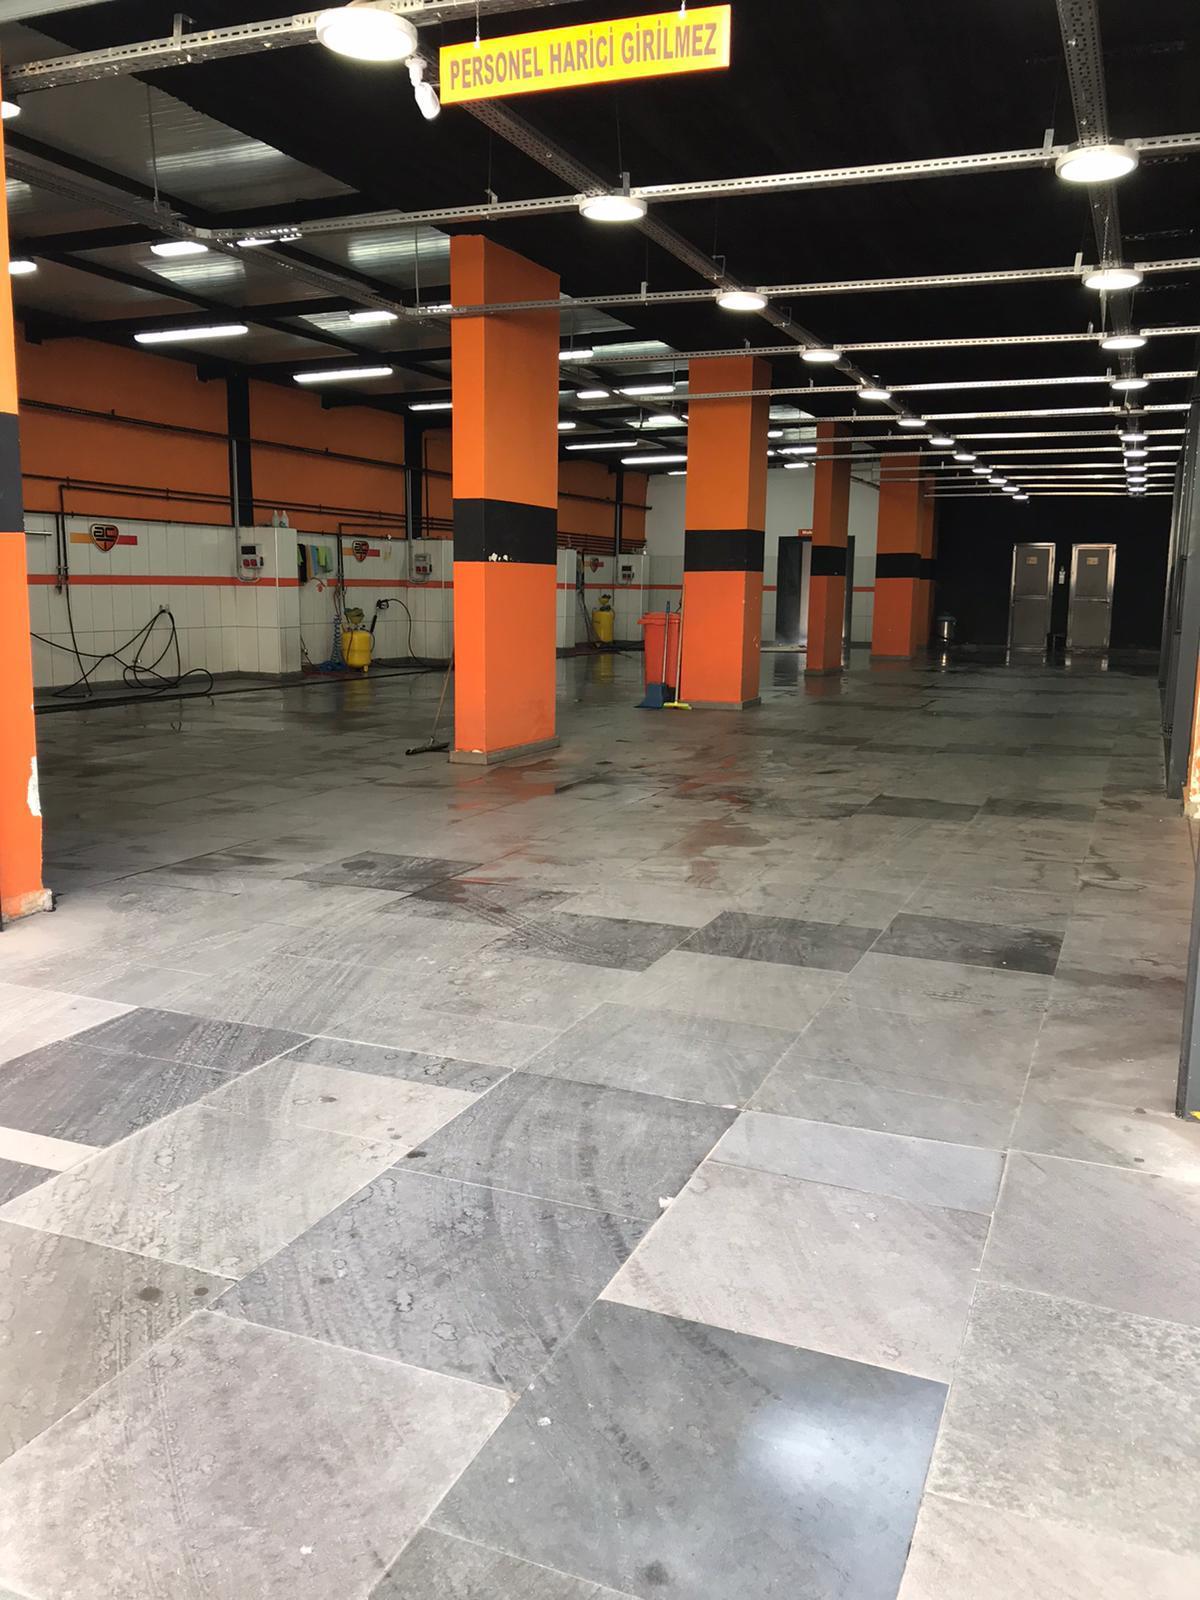 AutoClub Safir Garage - İstanbul Kurtköy